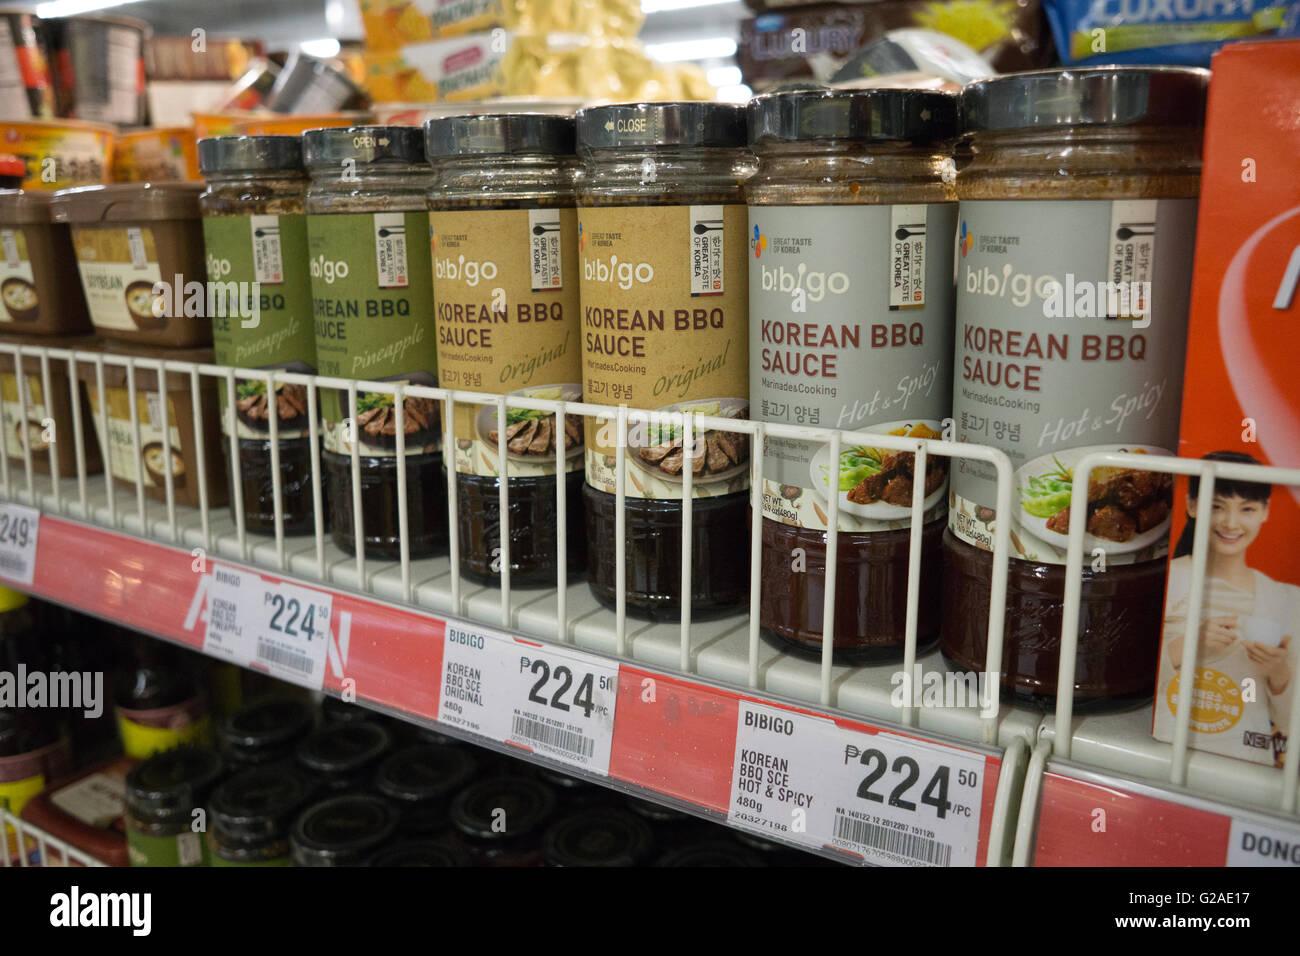 Bbq Sauce For Sale Part - 18: Korean BBQ Sauce On Sale In A Supermarket,Cebu City,Philippines